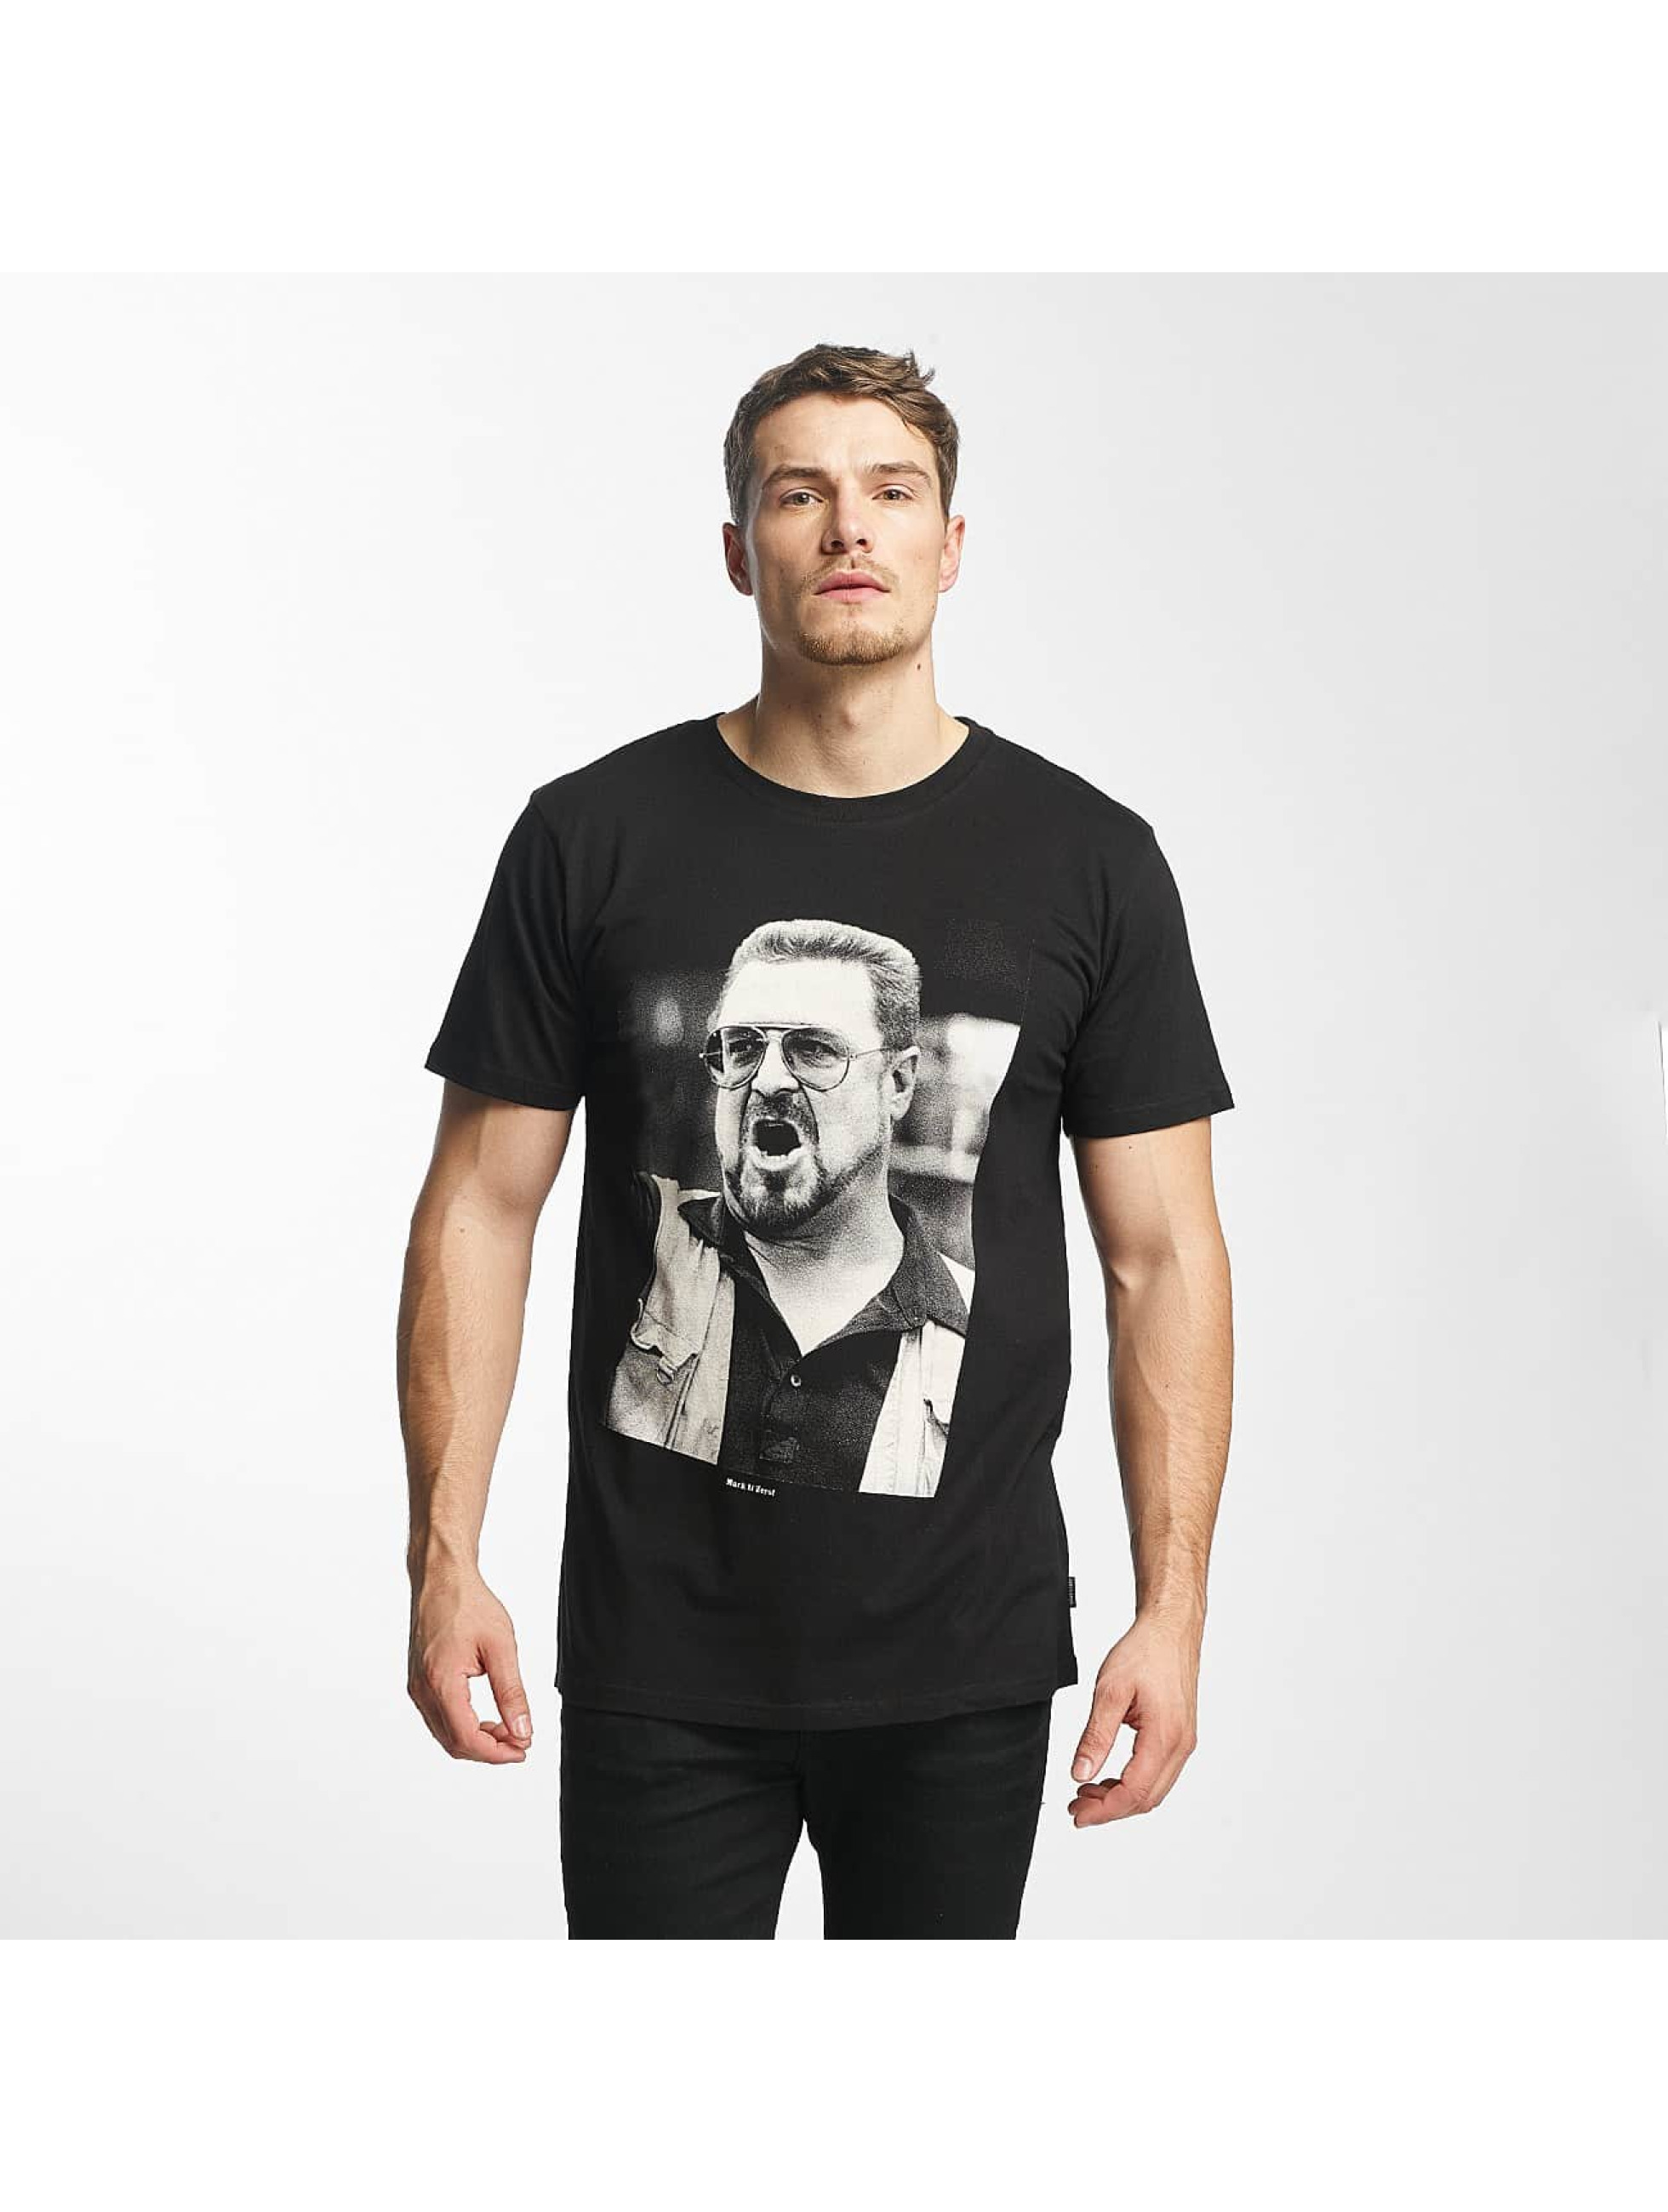 DEDICATED Männer T-Shirt Walter in schwarz